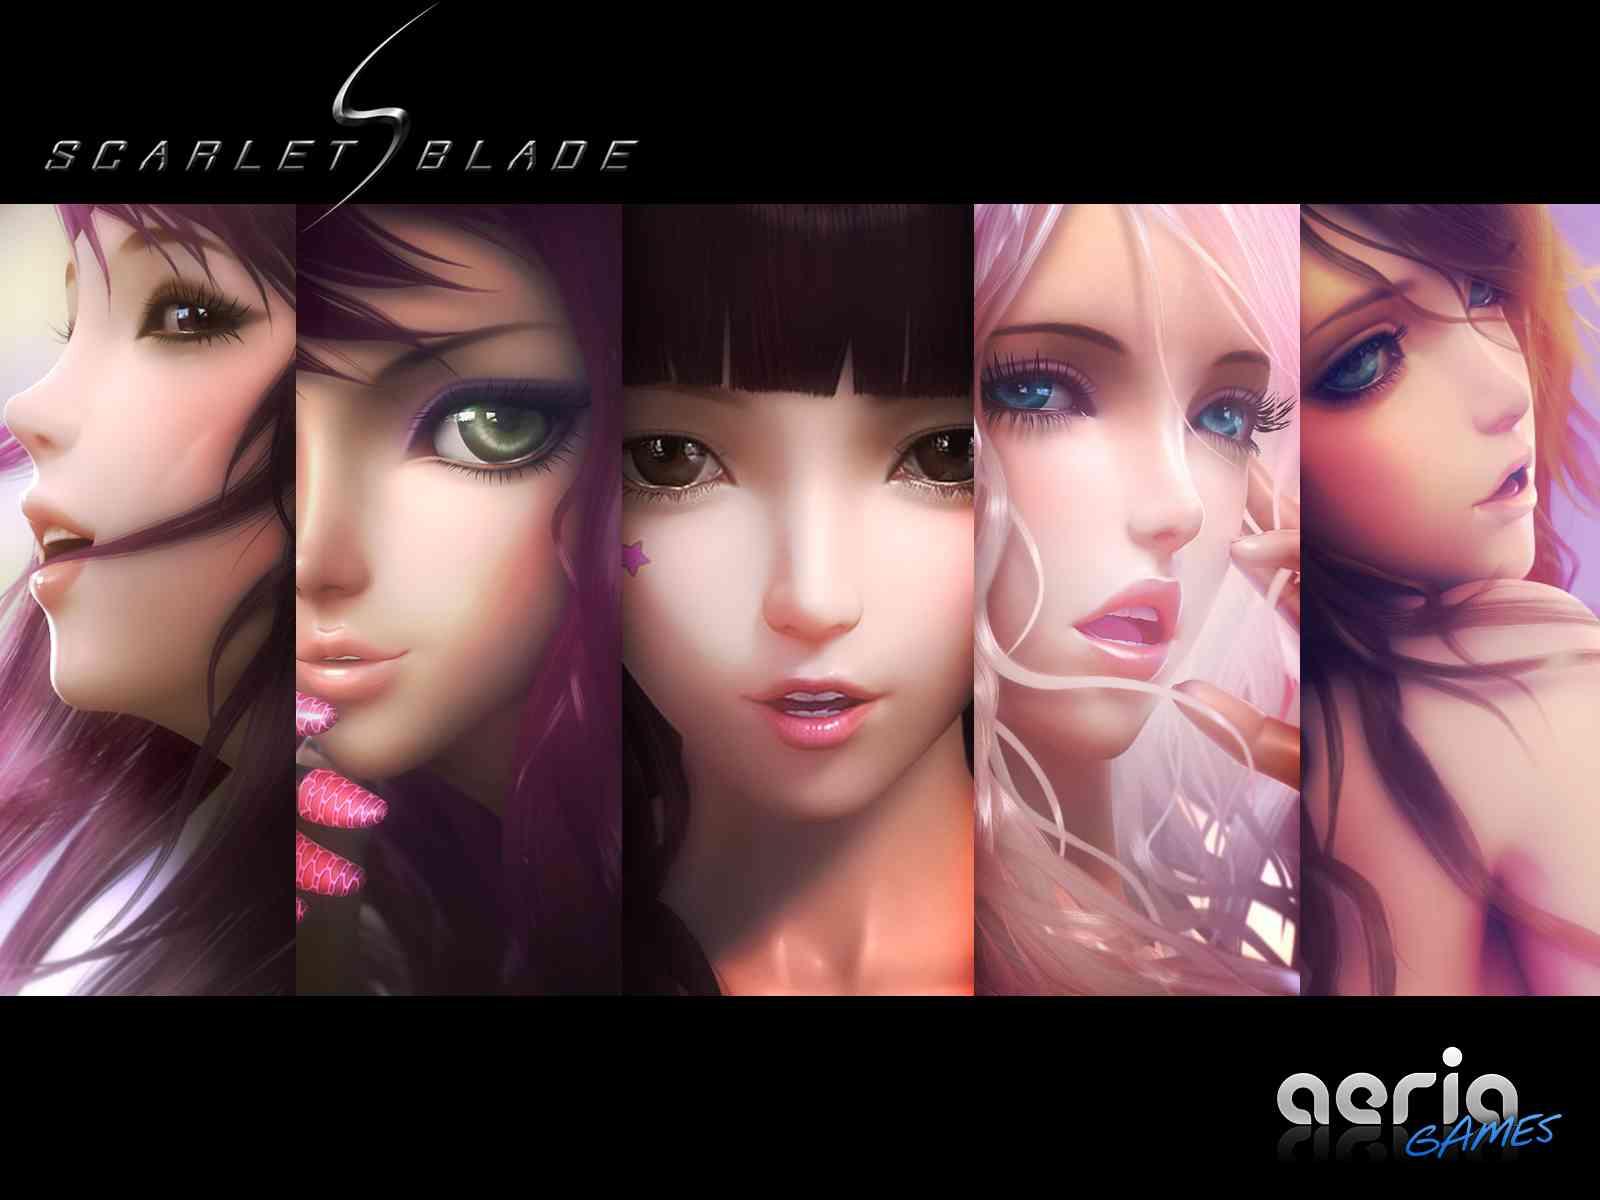 QueensBlade女王之刃性感3D作品全套珍藏 36.9M-FANCHENBIZ